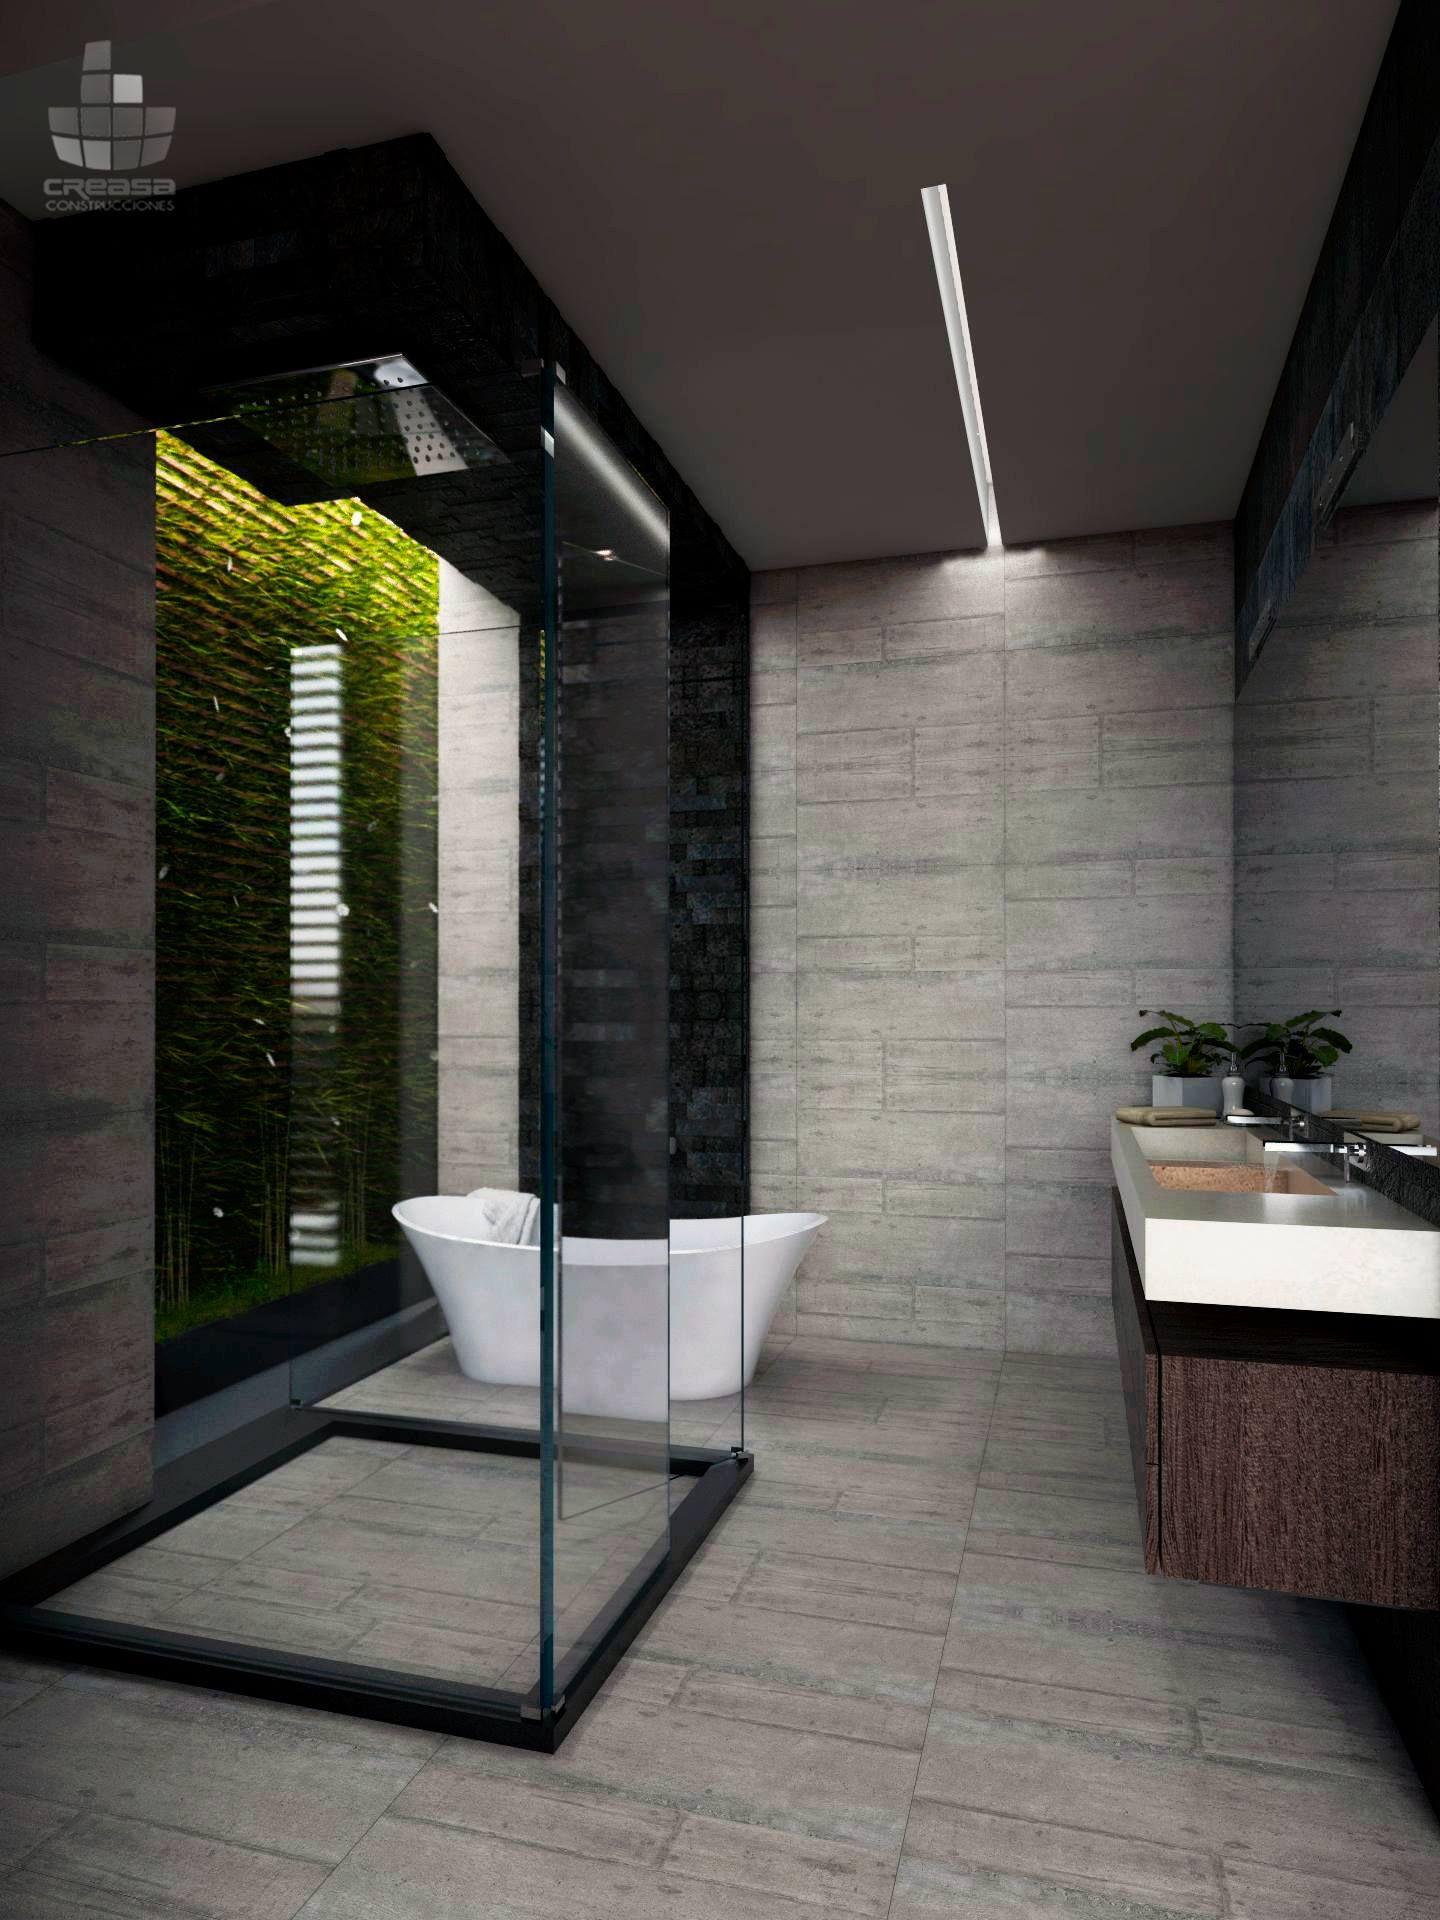 Creasa Timeline Photos House Bathroom Interior